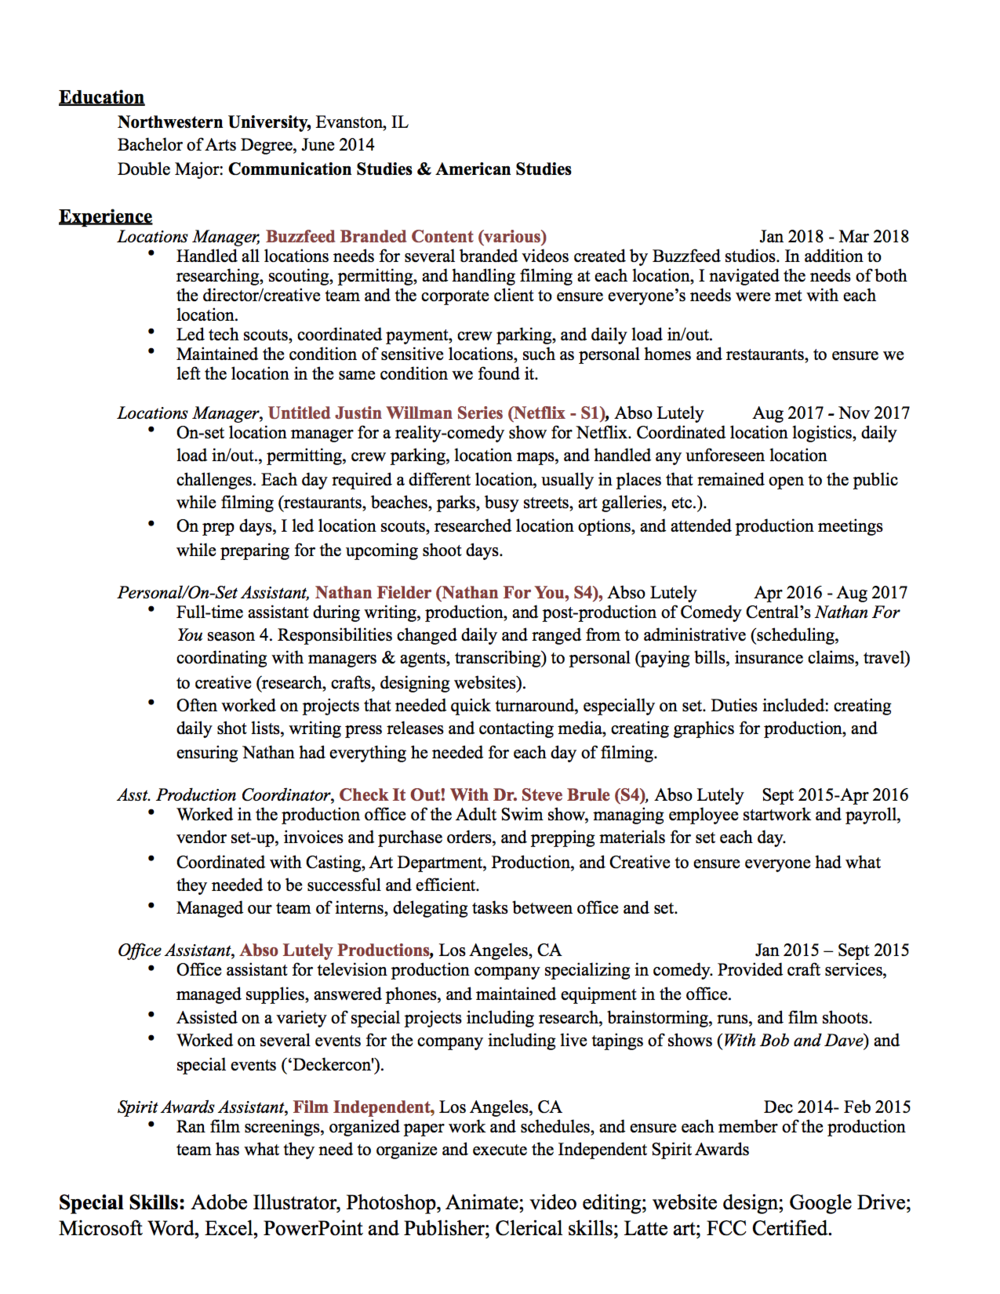 Resume — Bridget Illing